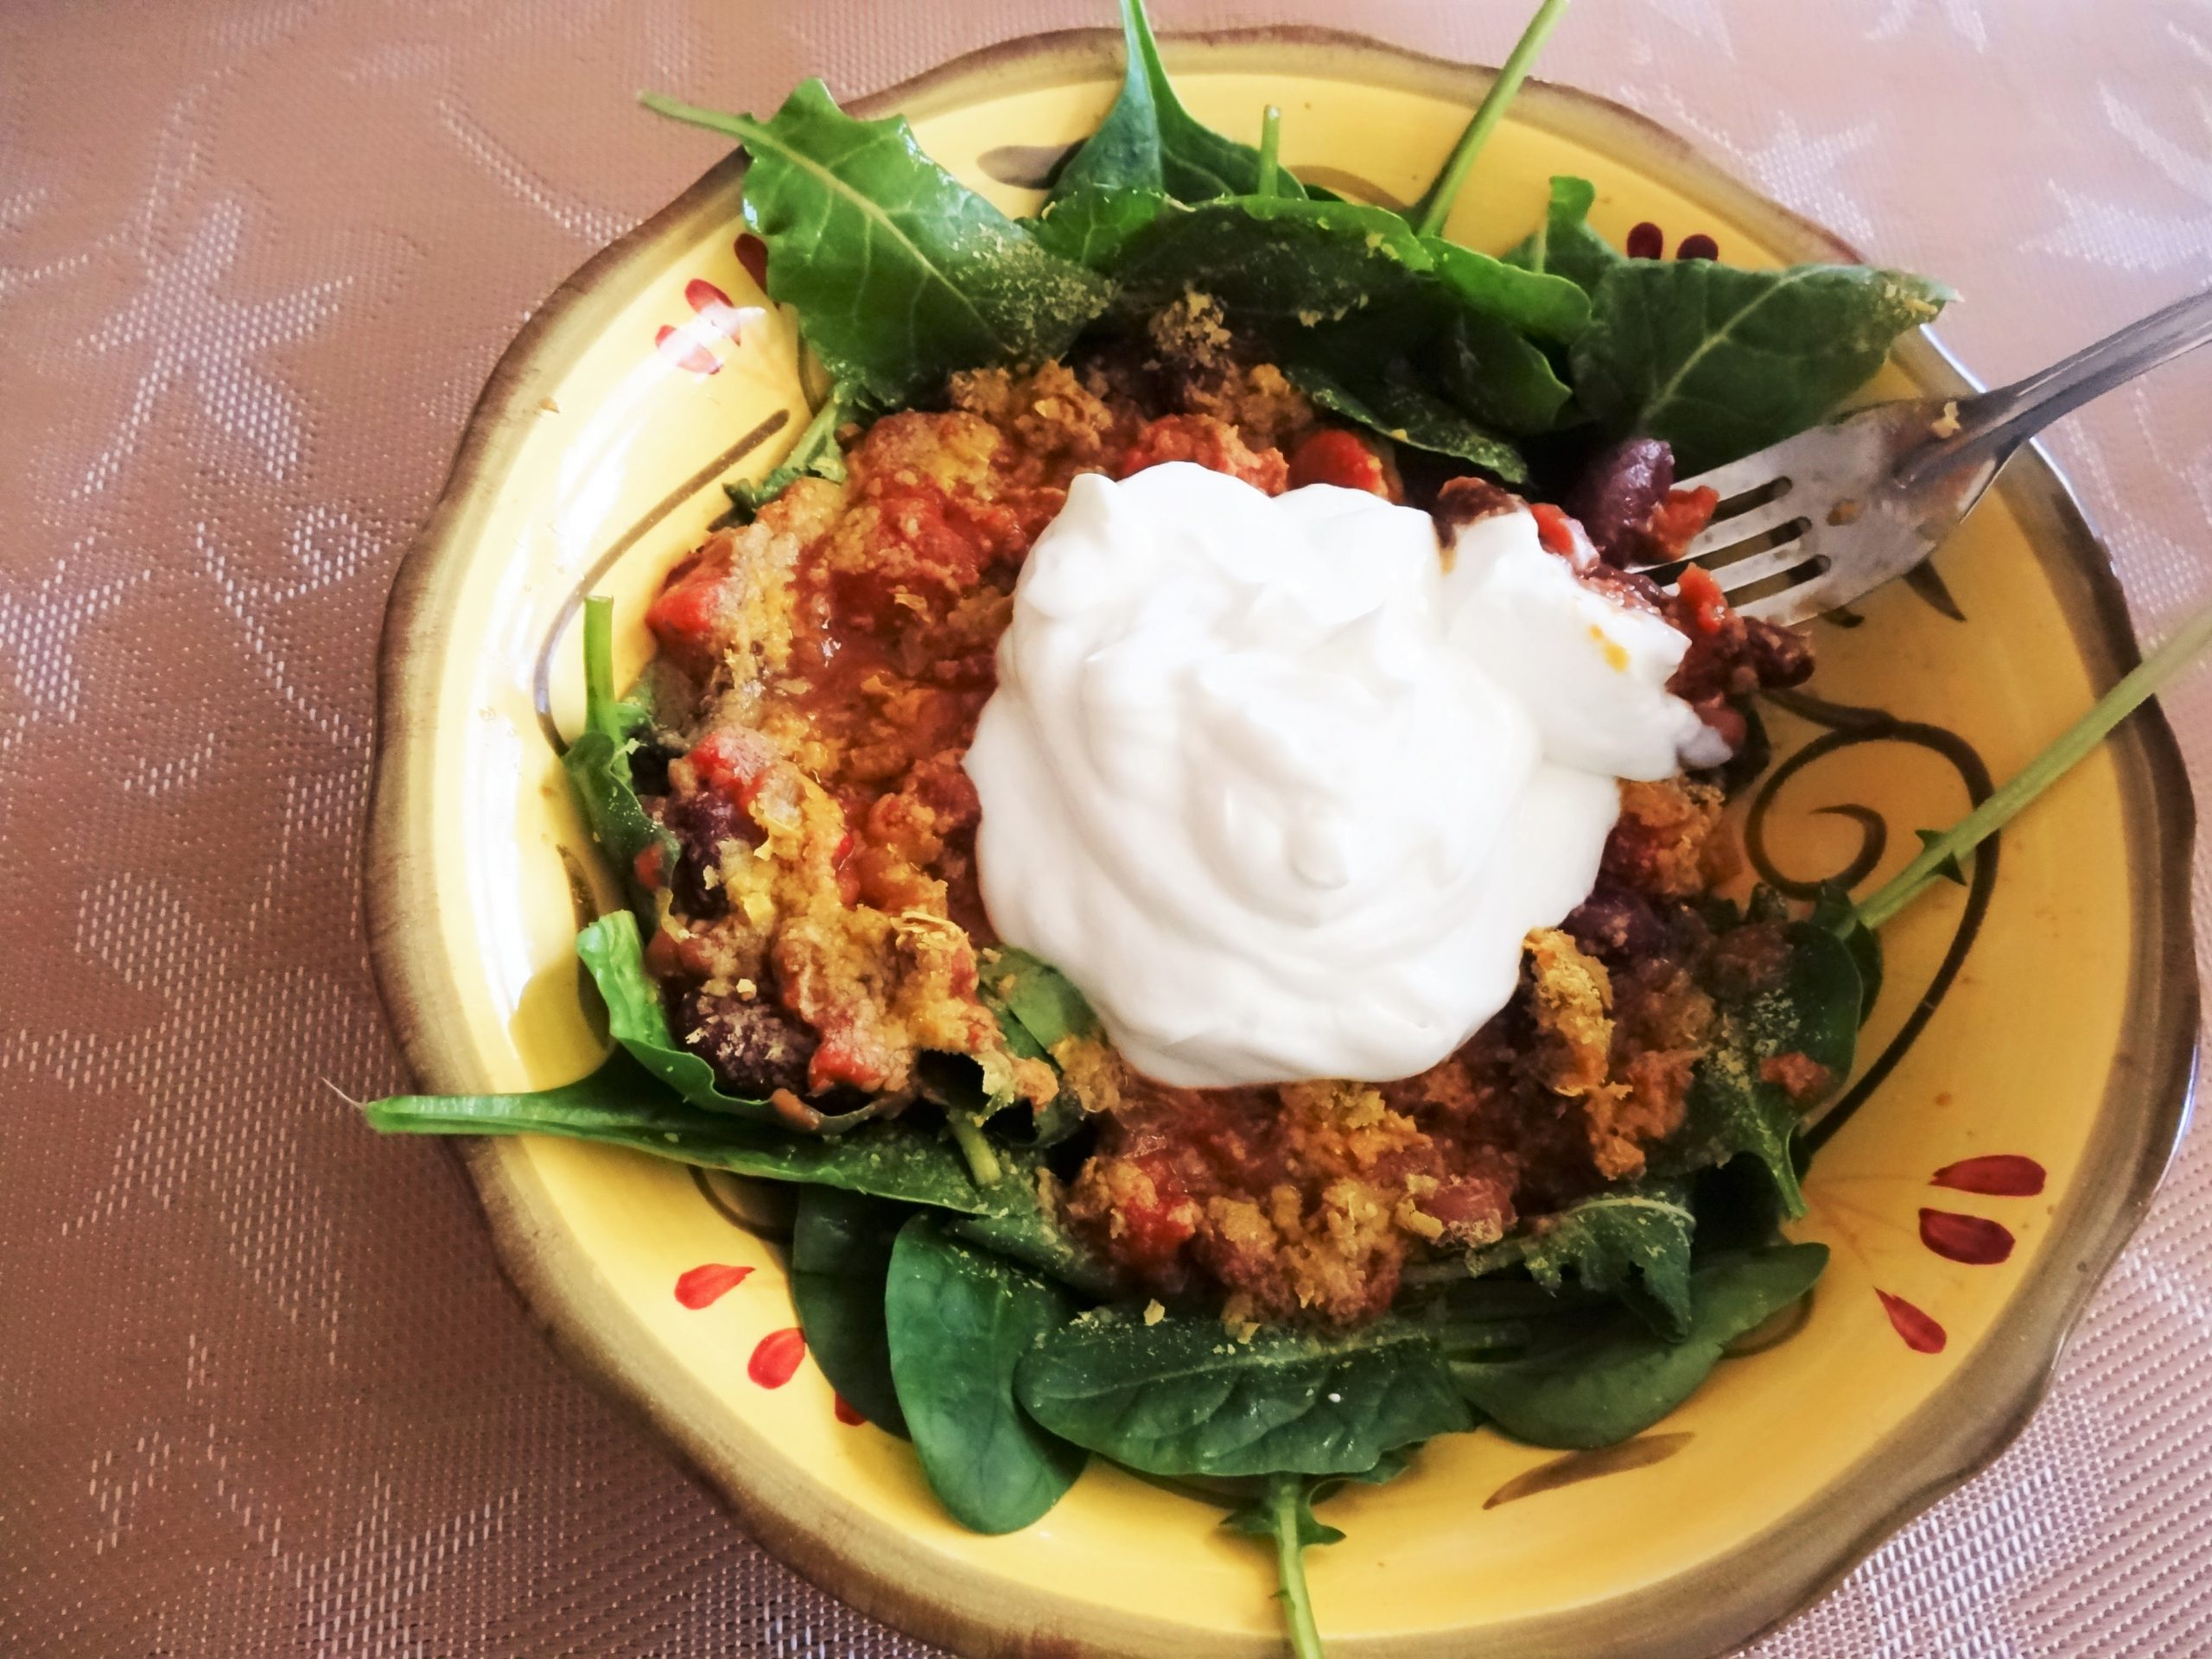 Easy Chili Salad with Greek Yogurt and Nutritional Yeast